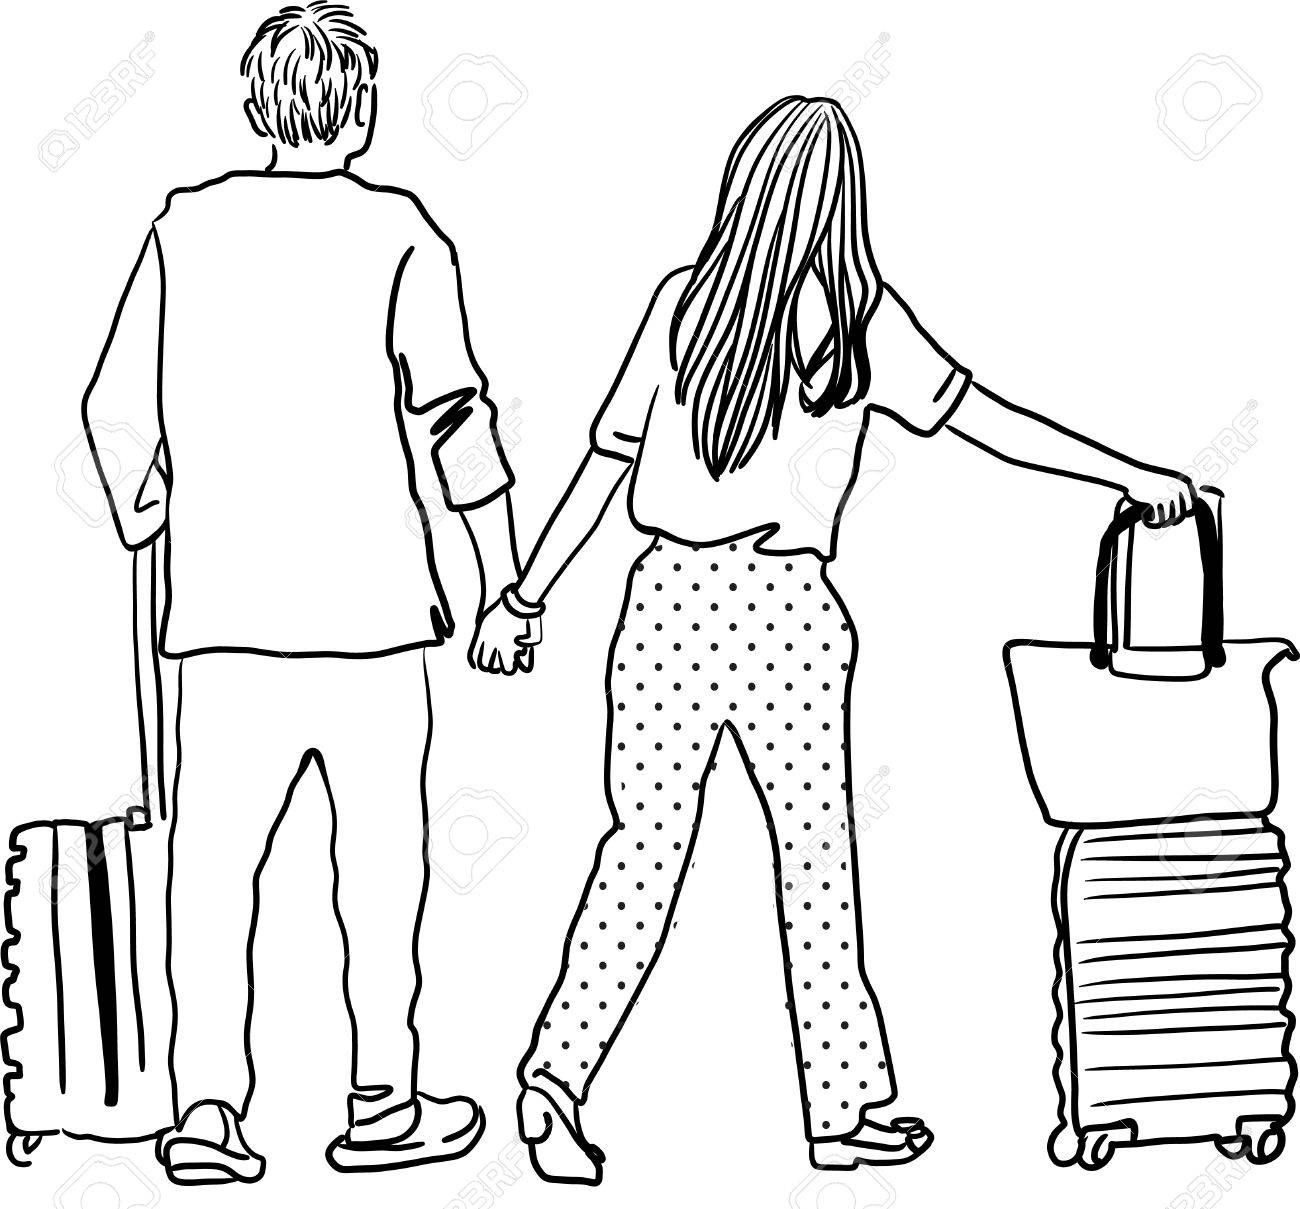 1300x1209 Drawing Of Young Man And Woman Walking At Airport Royalty Free